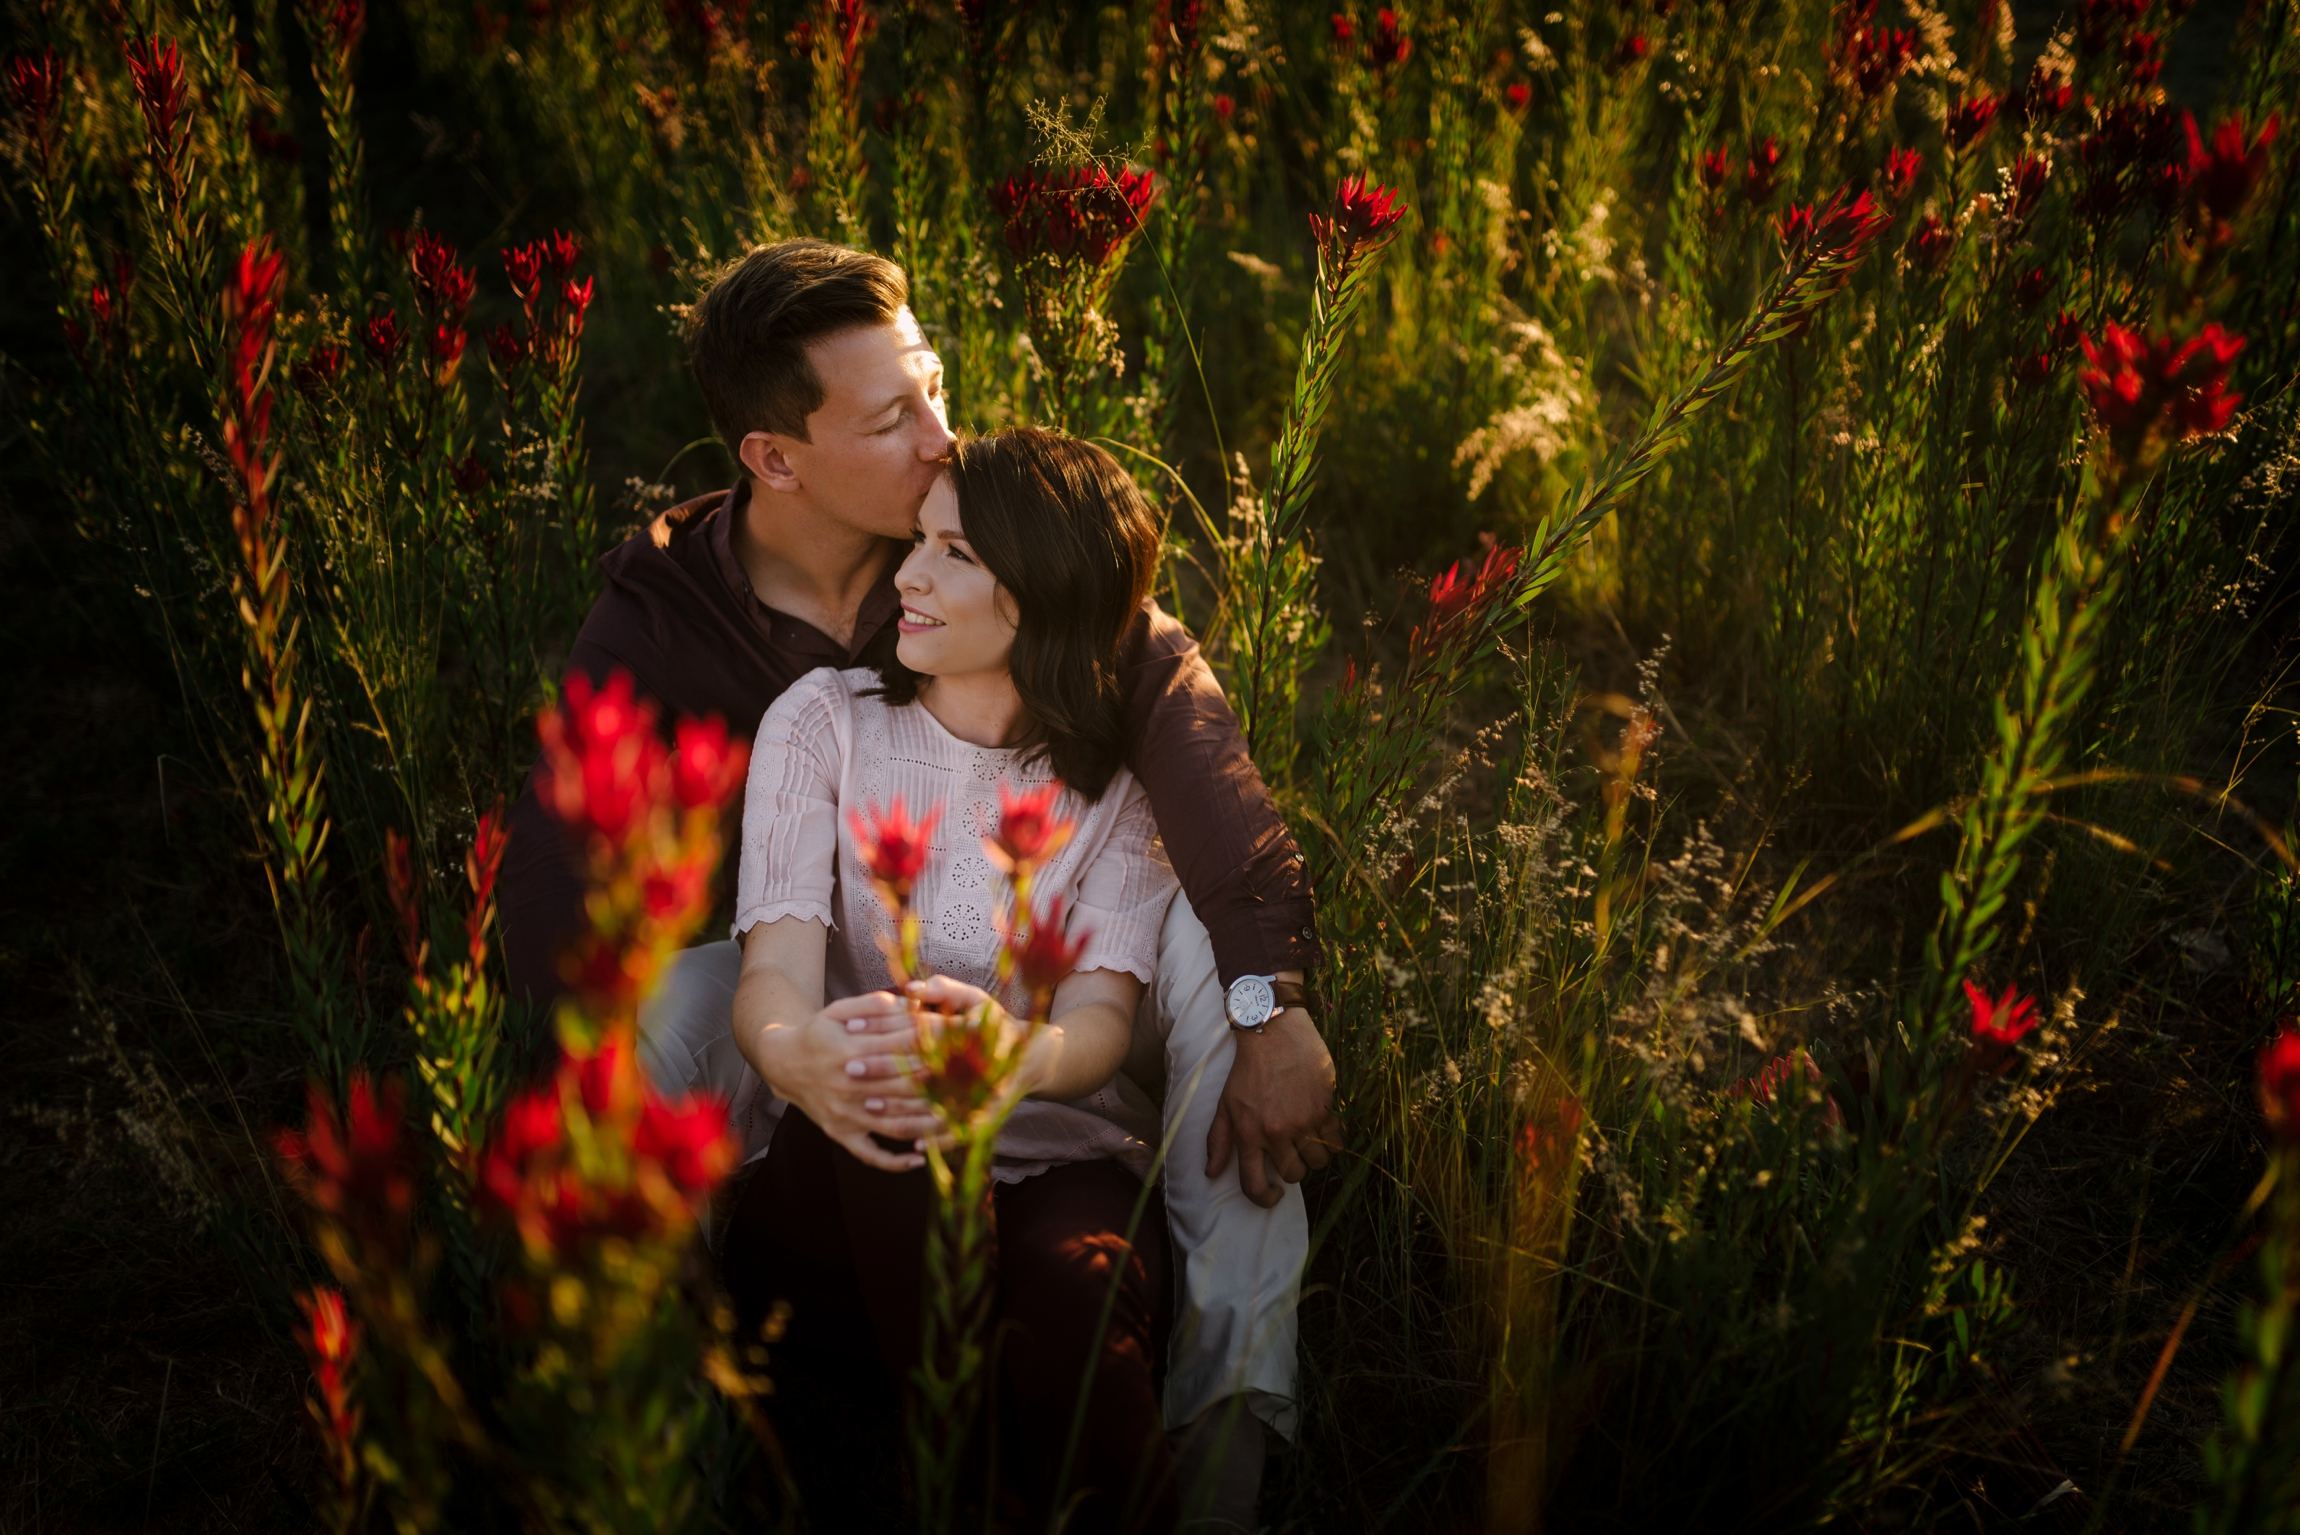 harmonie proteas, engagement shoot, wedding photos, wedding, gauteng wedding photographer, photographer